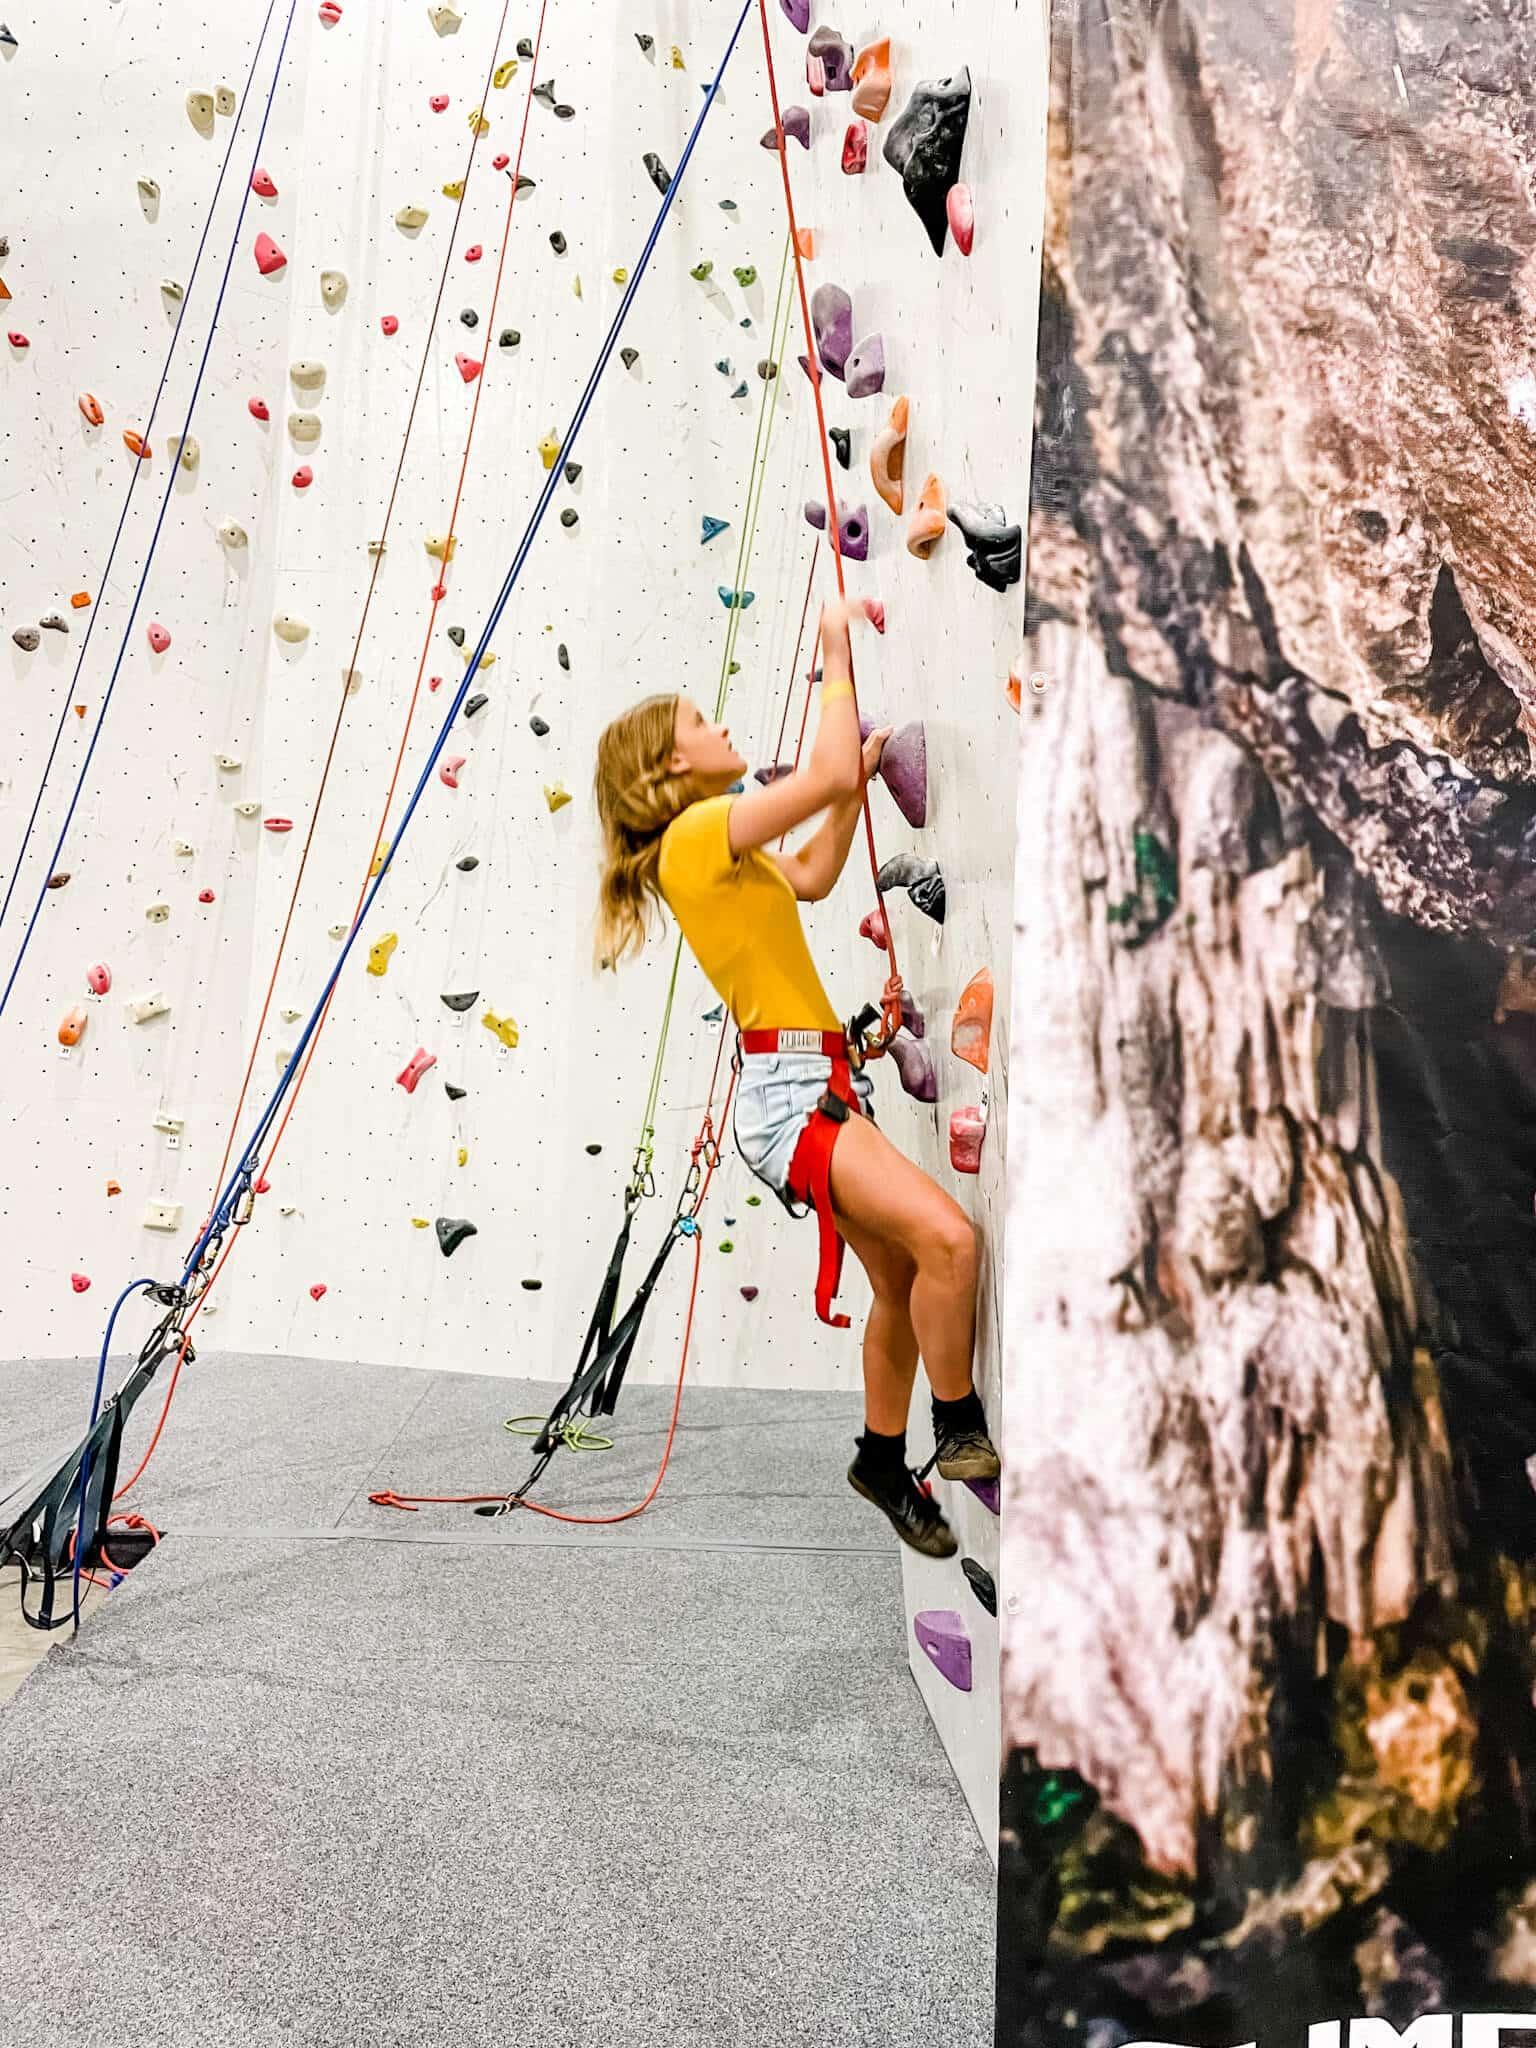 Rockface Indoor Rock Climbing Centre